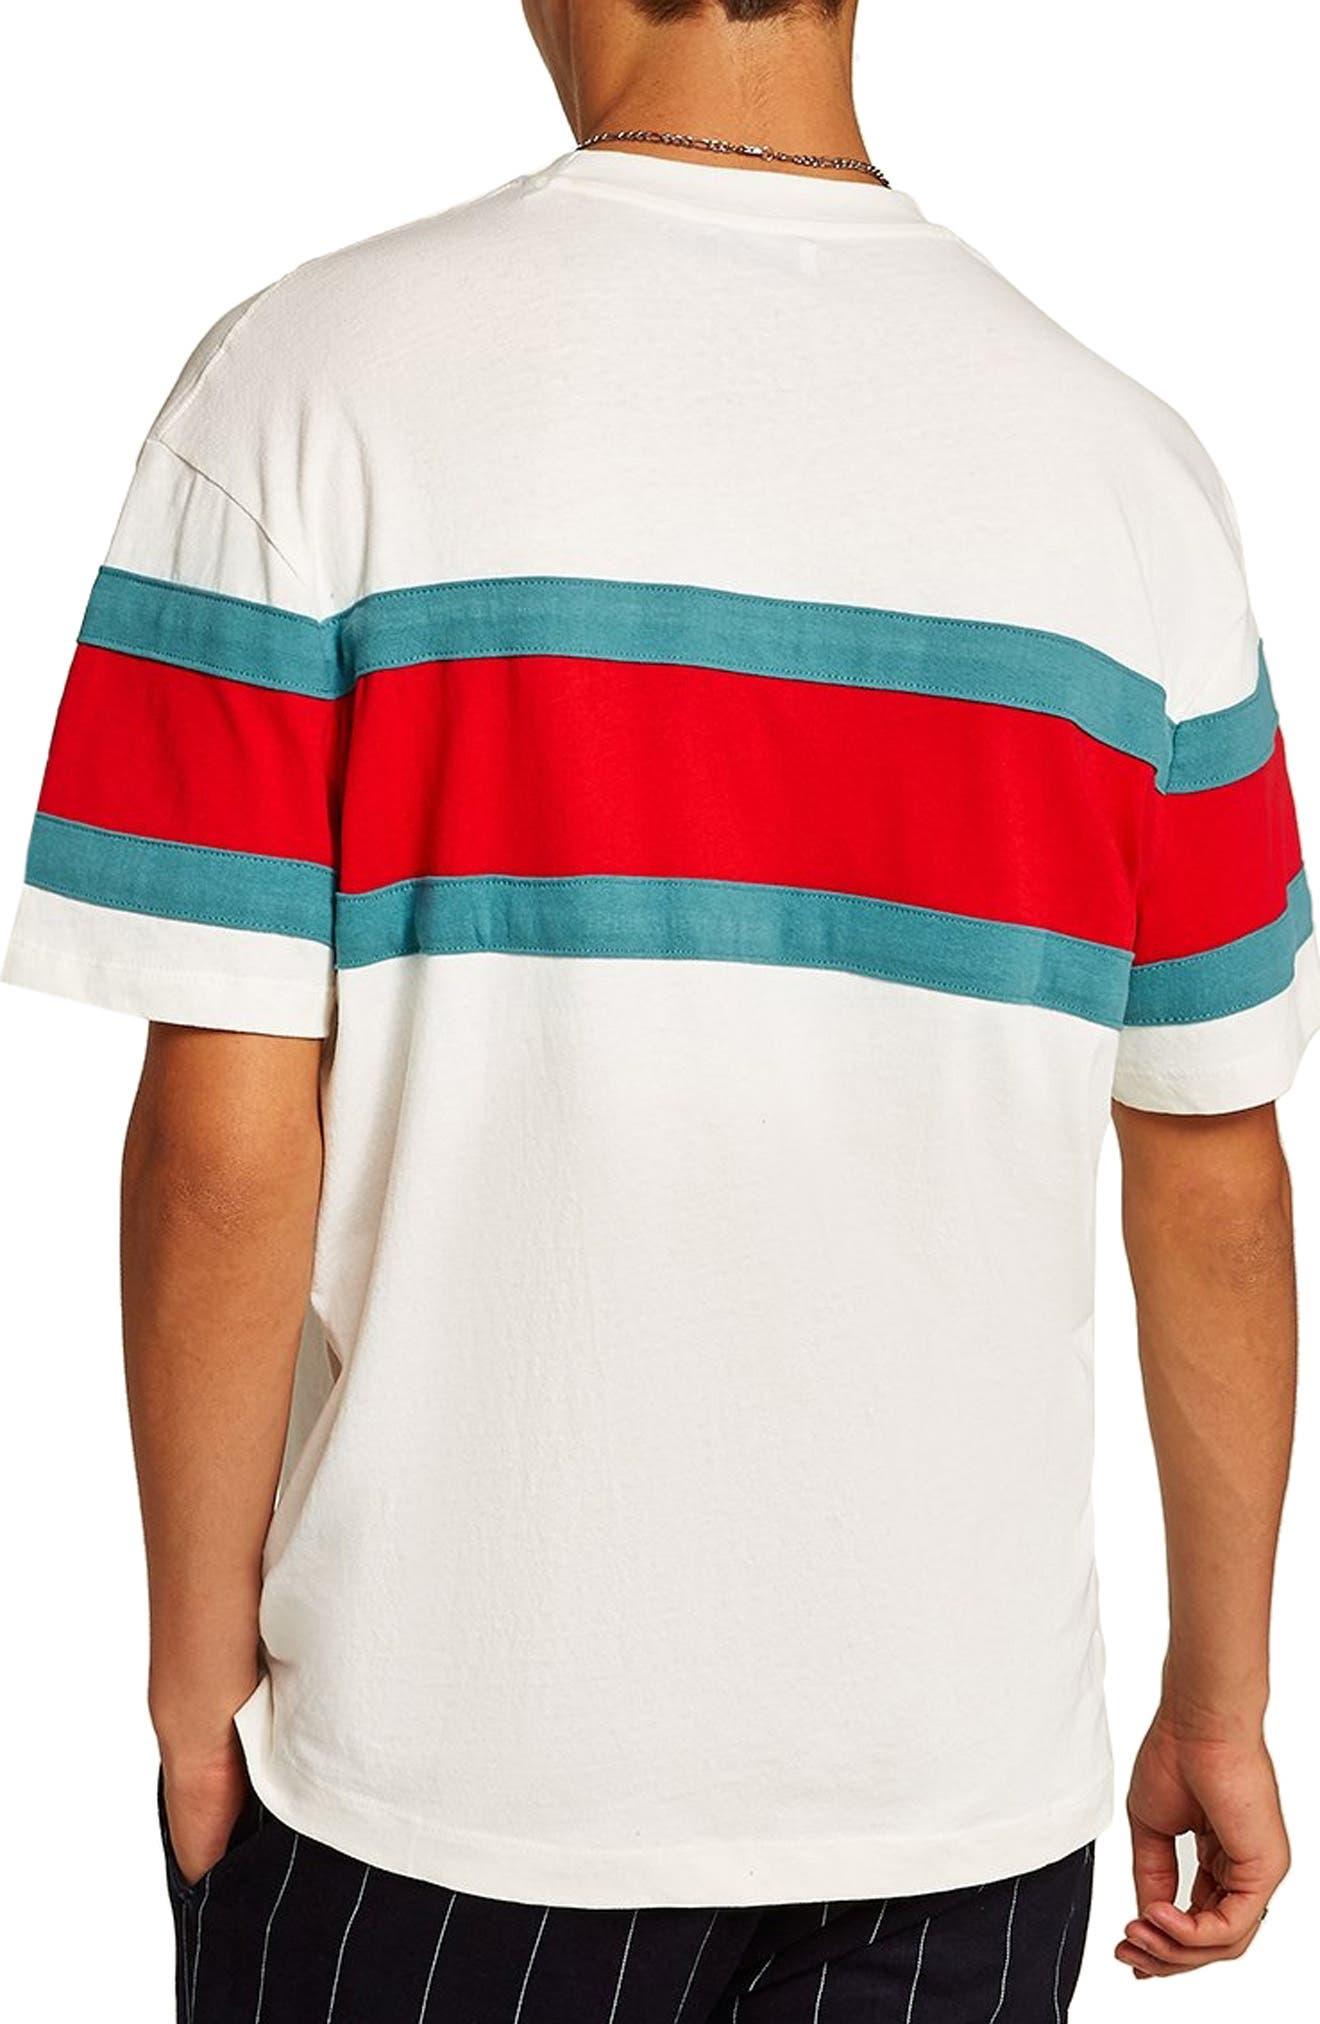 Oversize Stripe T-Shirt,                             Alternate thumbnail 2, color,                             101